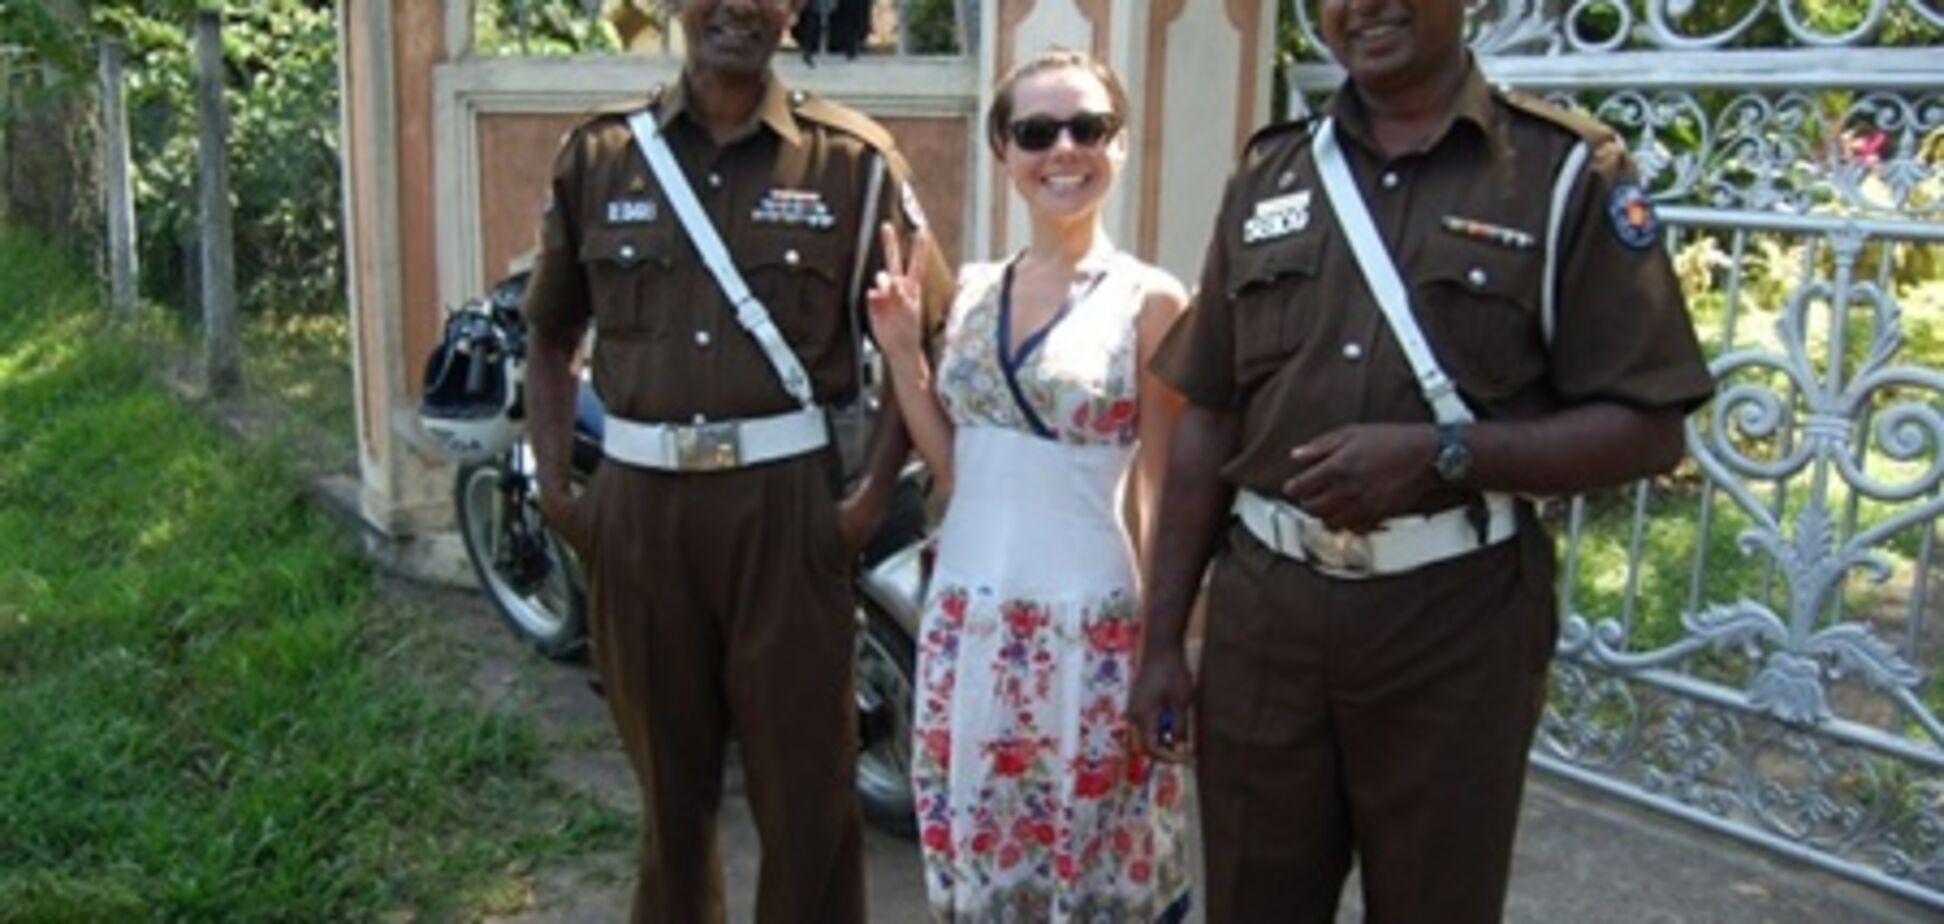 Гордиенко соблазнила полицию Шри-Ланки. Фото